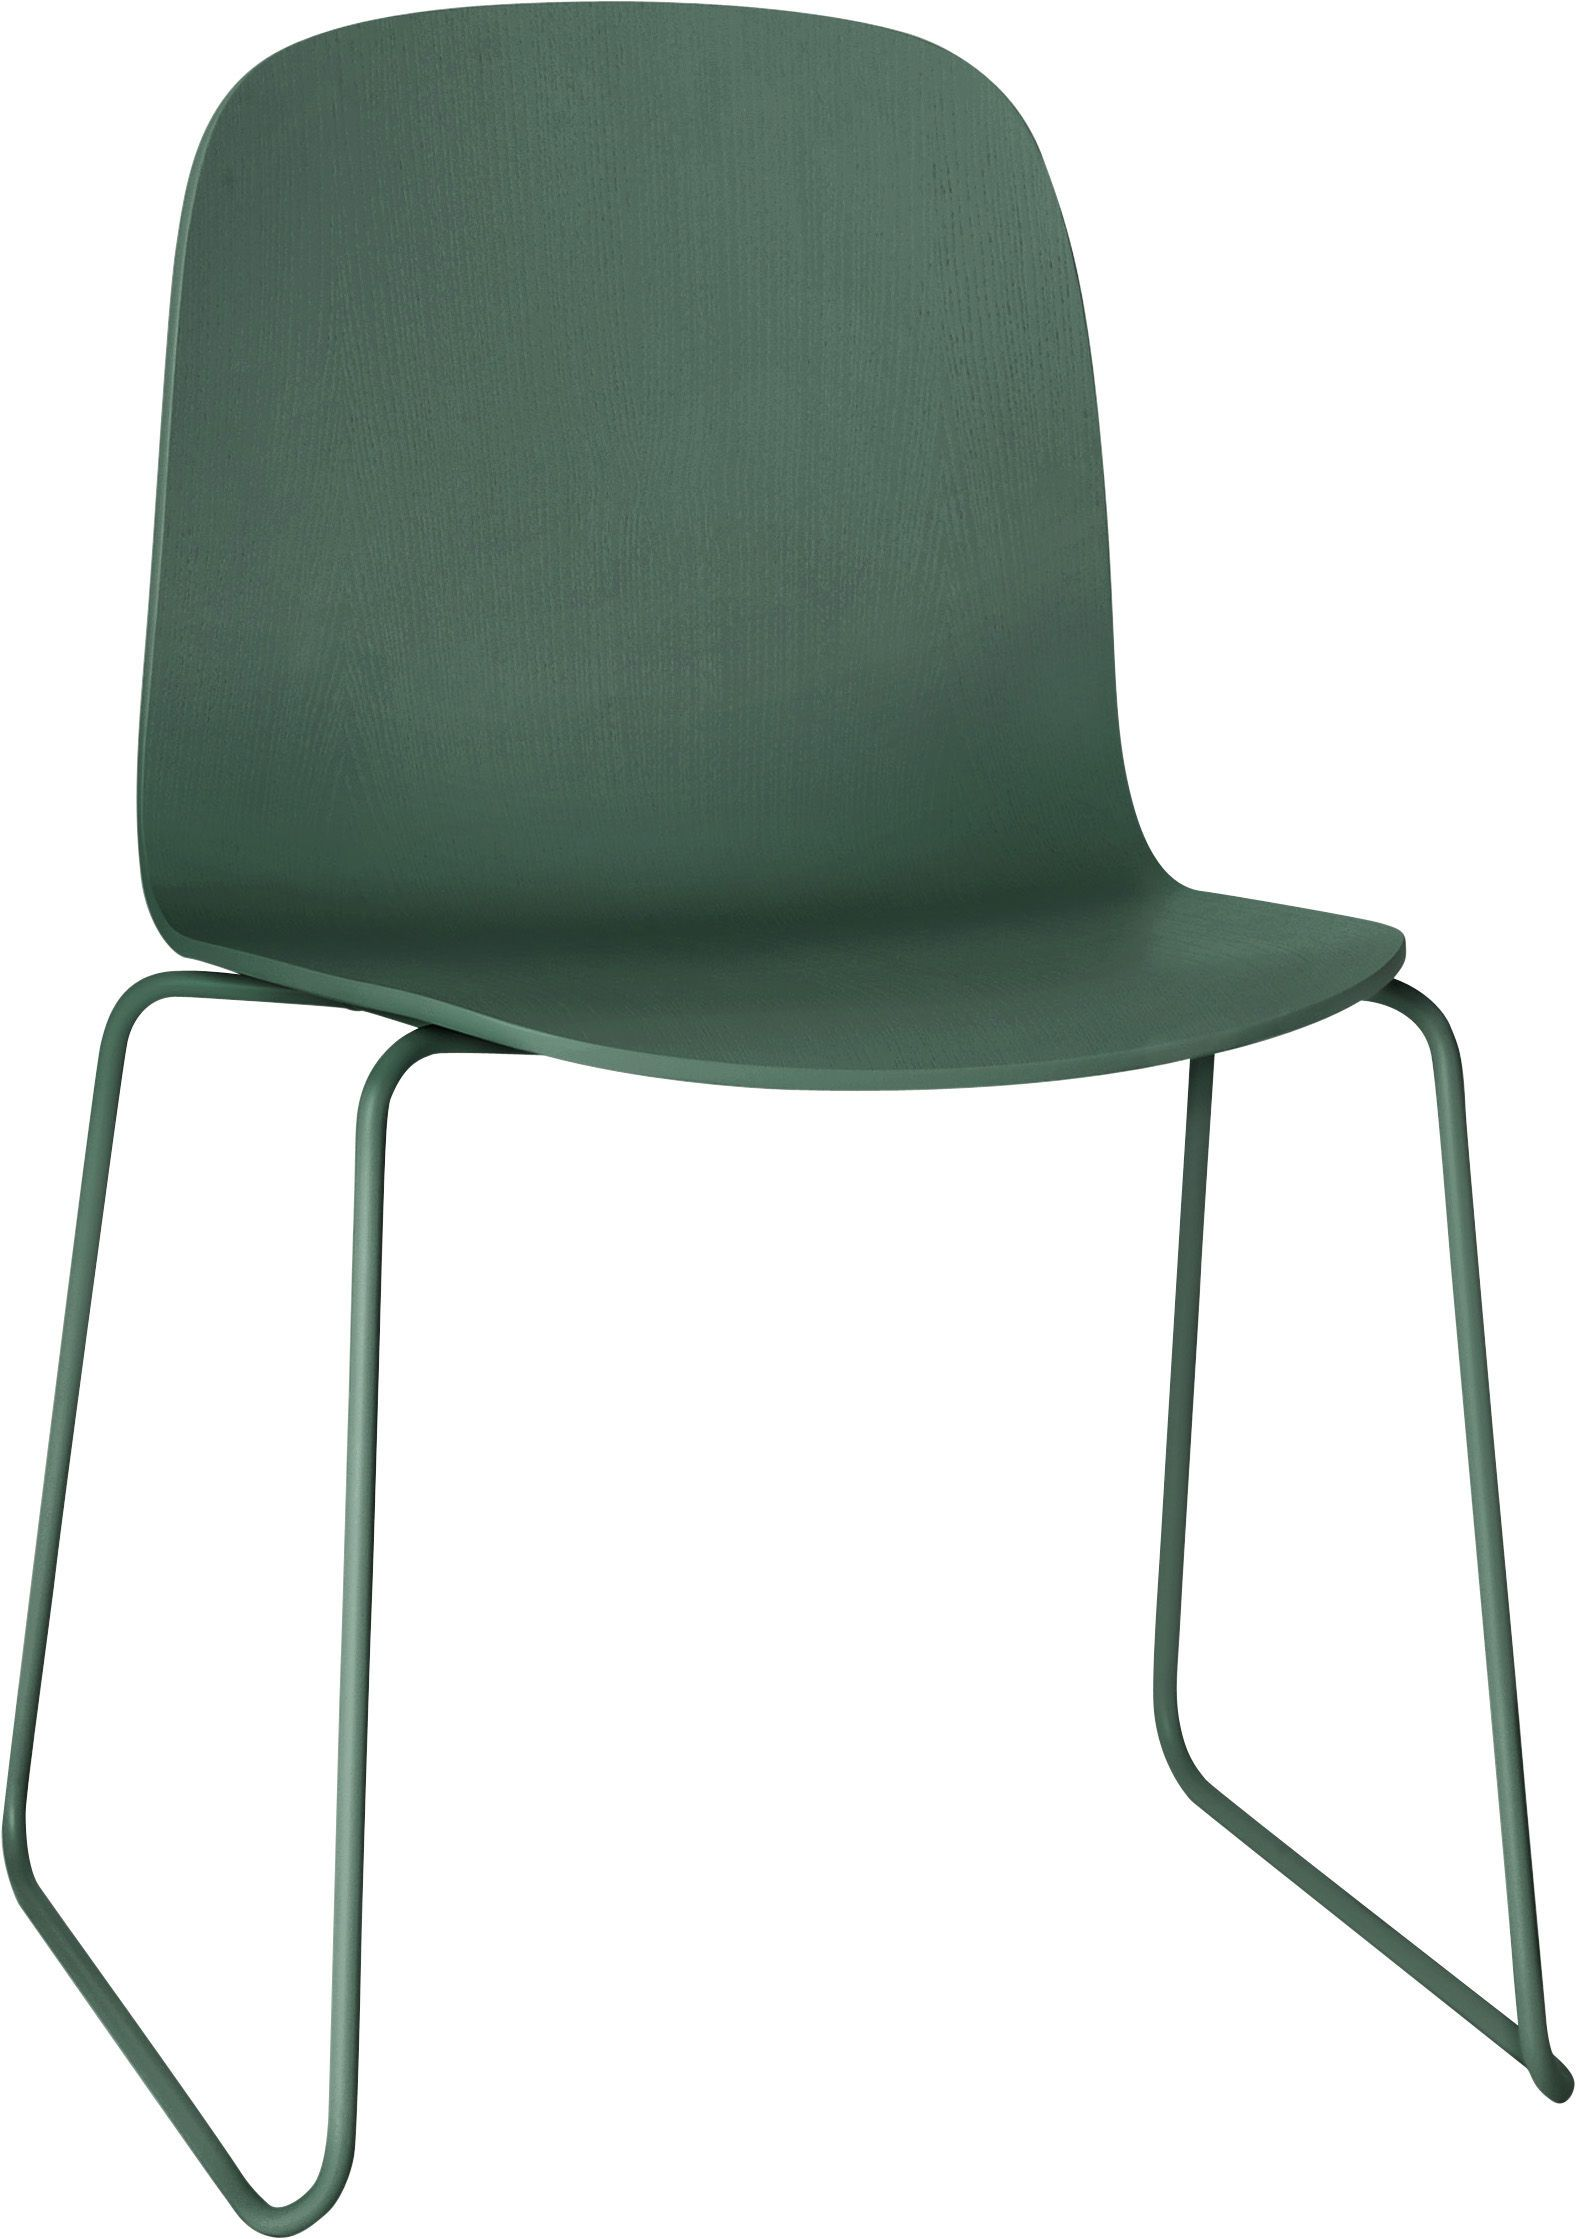 Chaise empilable Visu / Bois - Pied traineau | Pinterest | Stacking ...